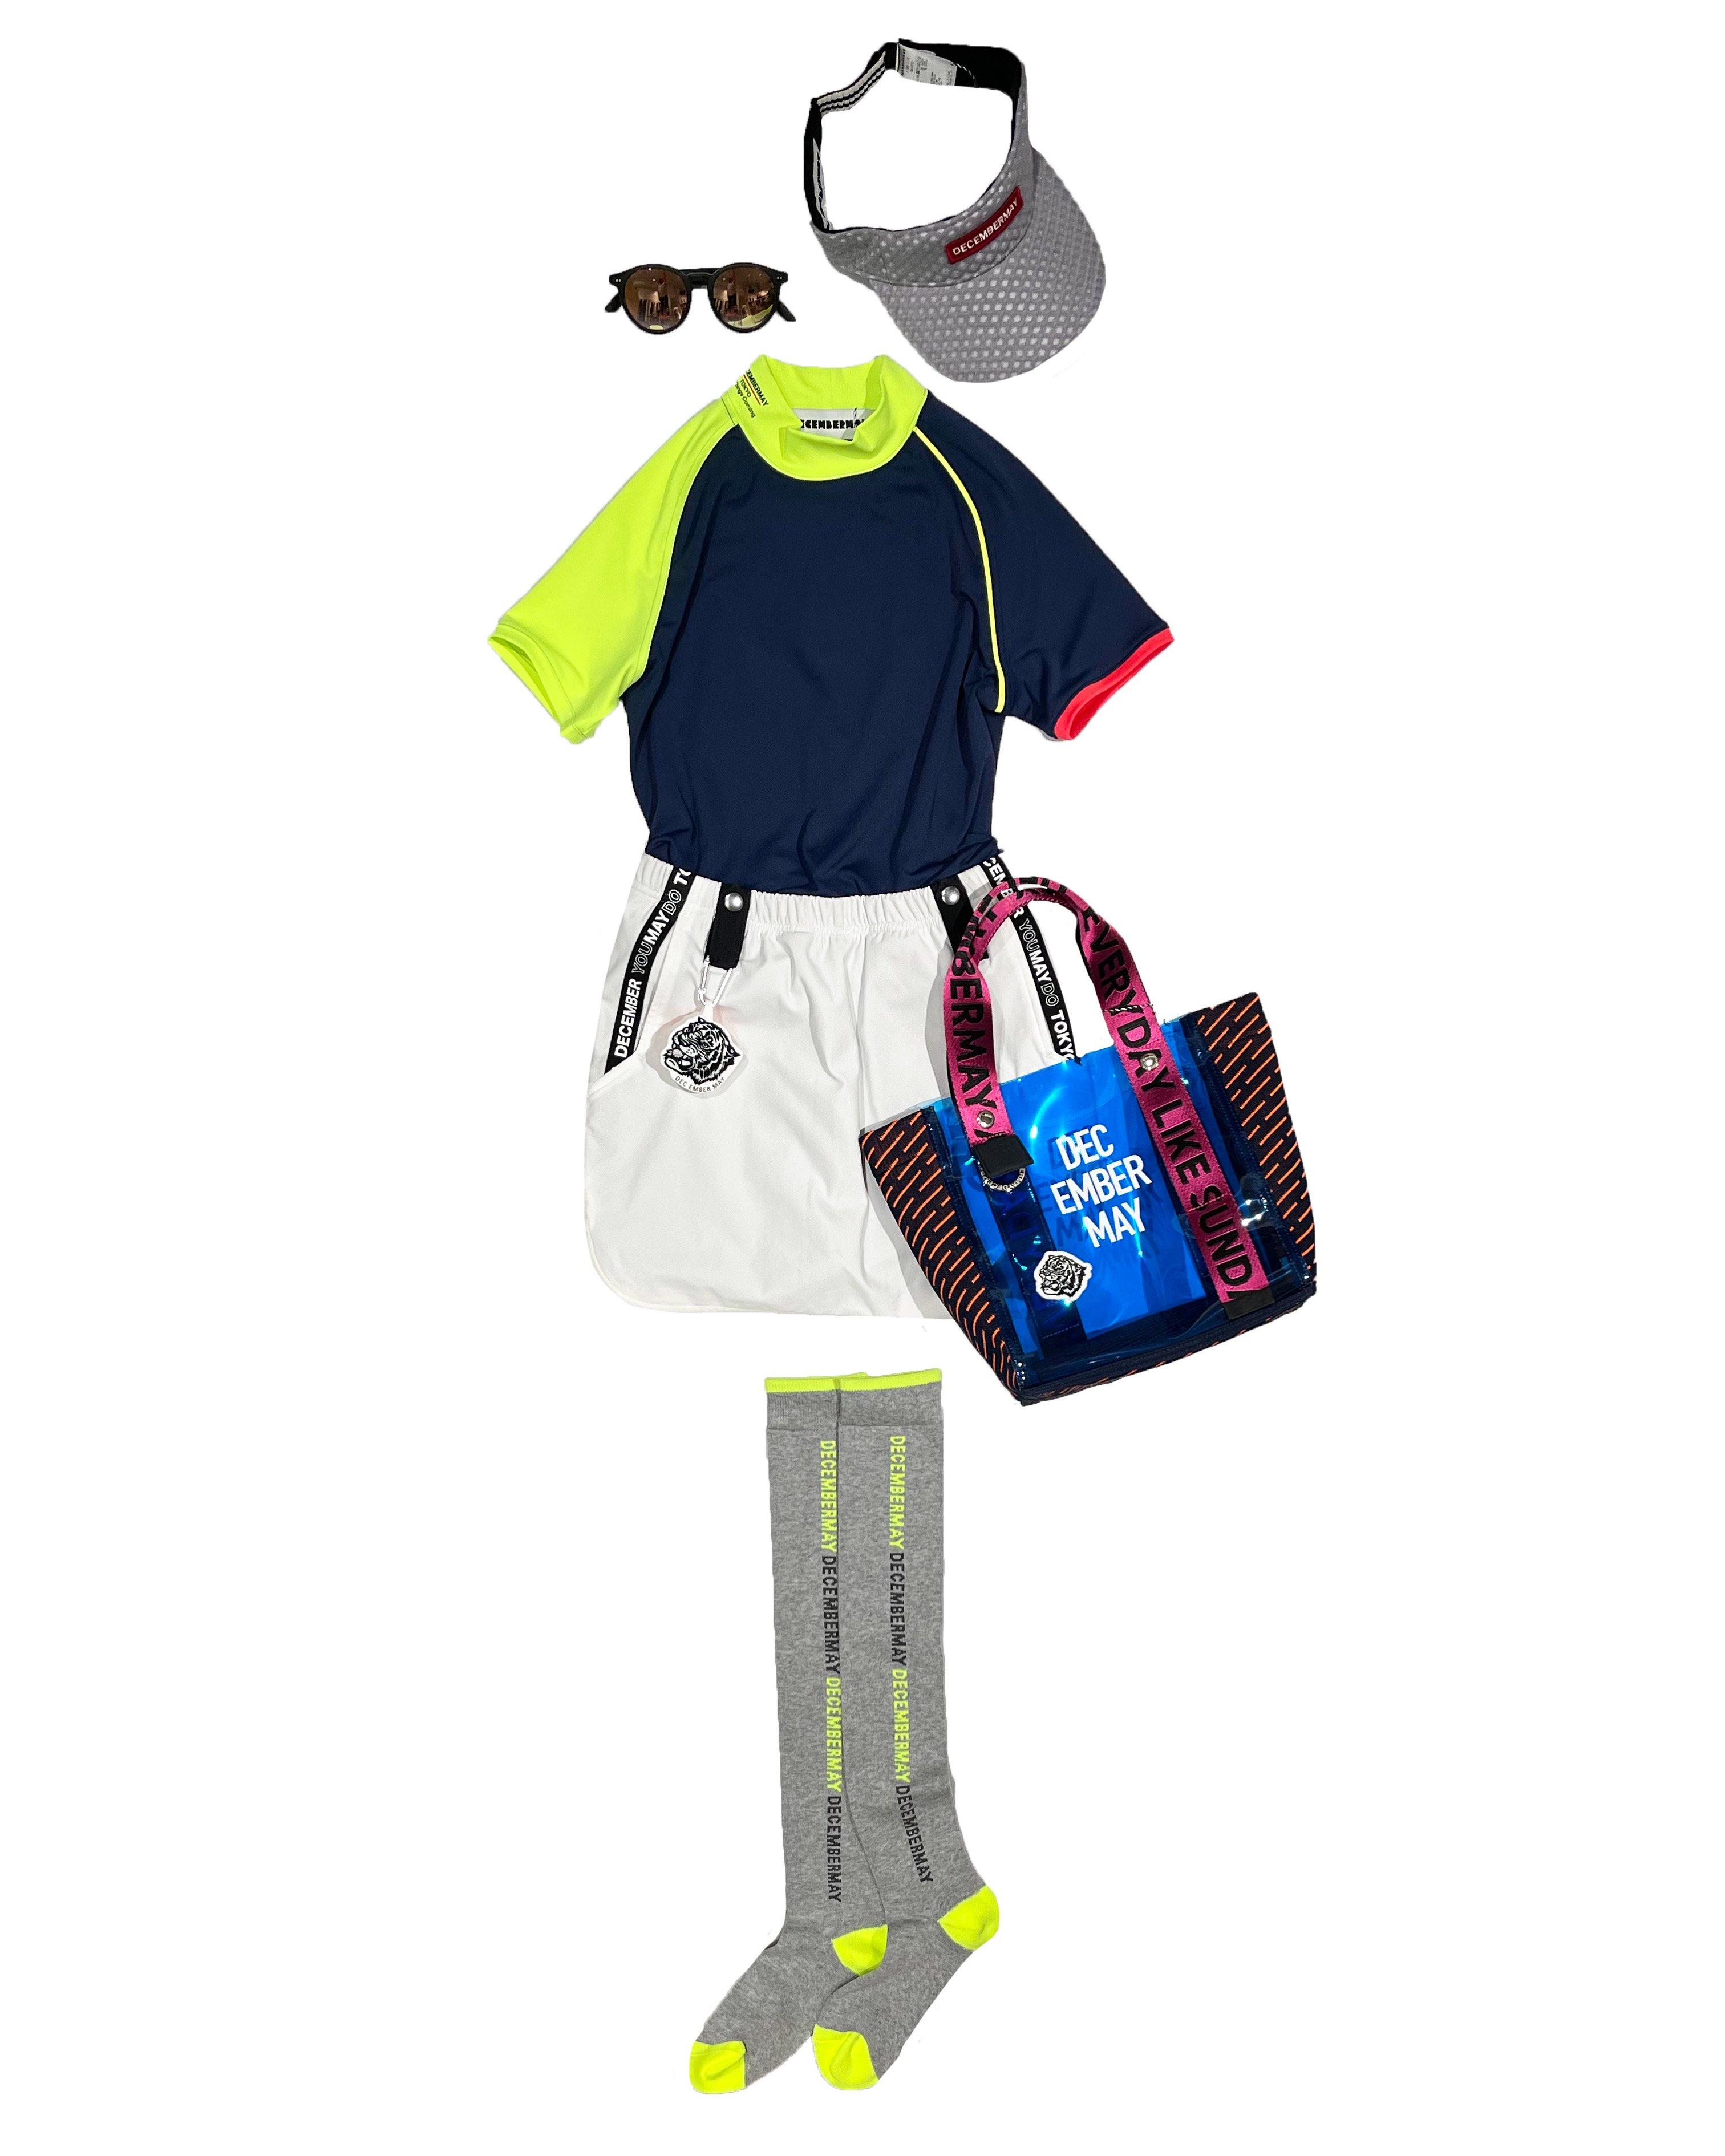 Heatperforma some-tight Skirt / women